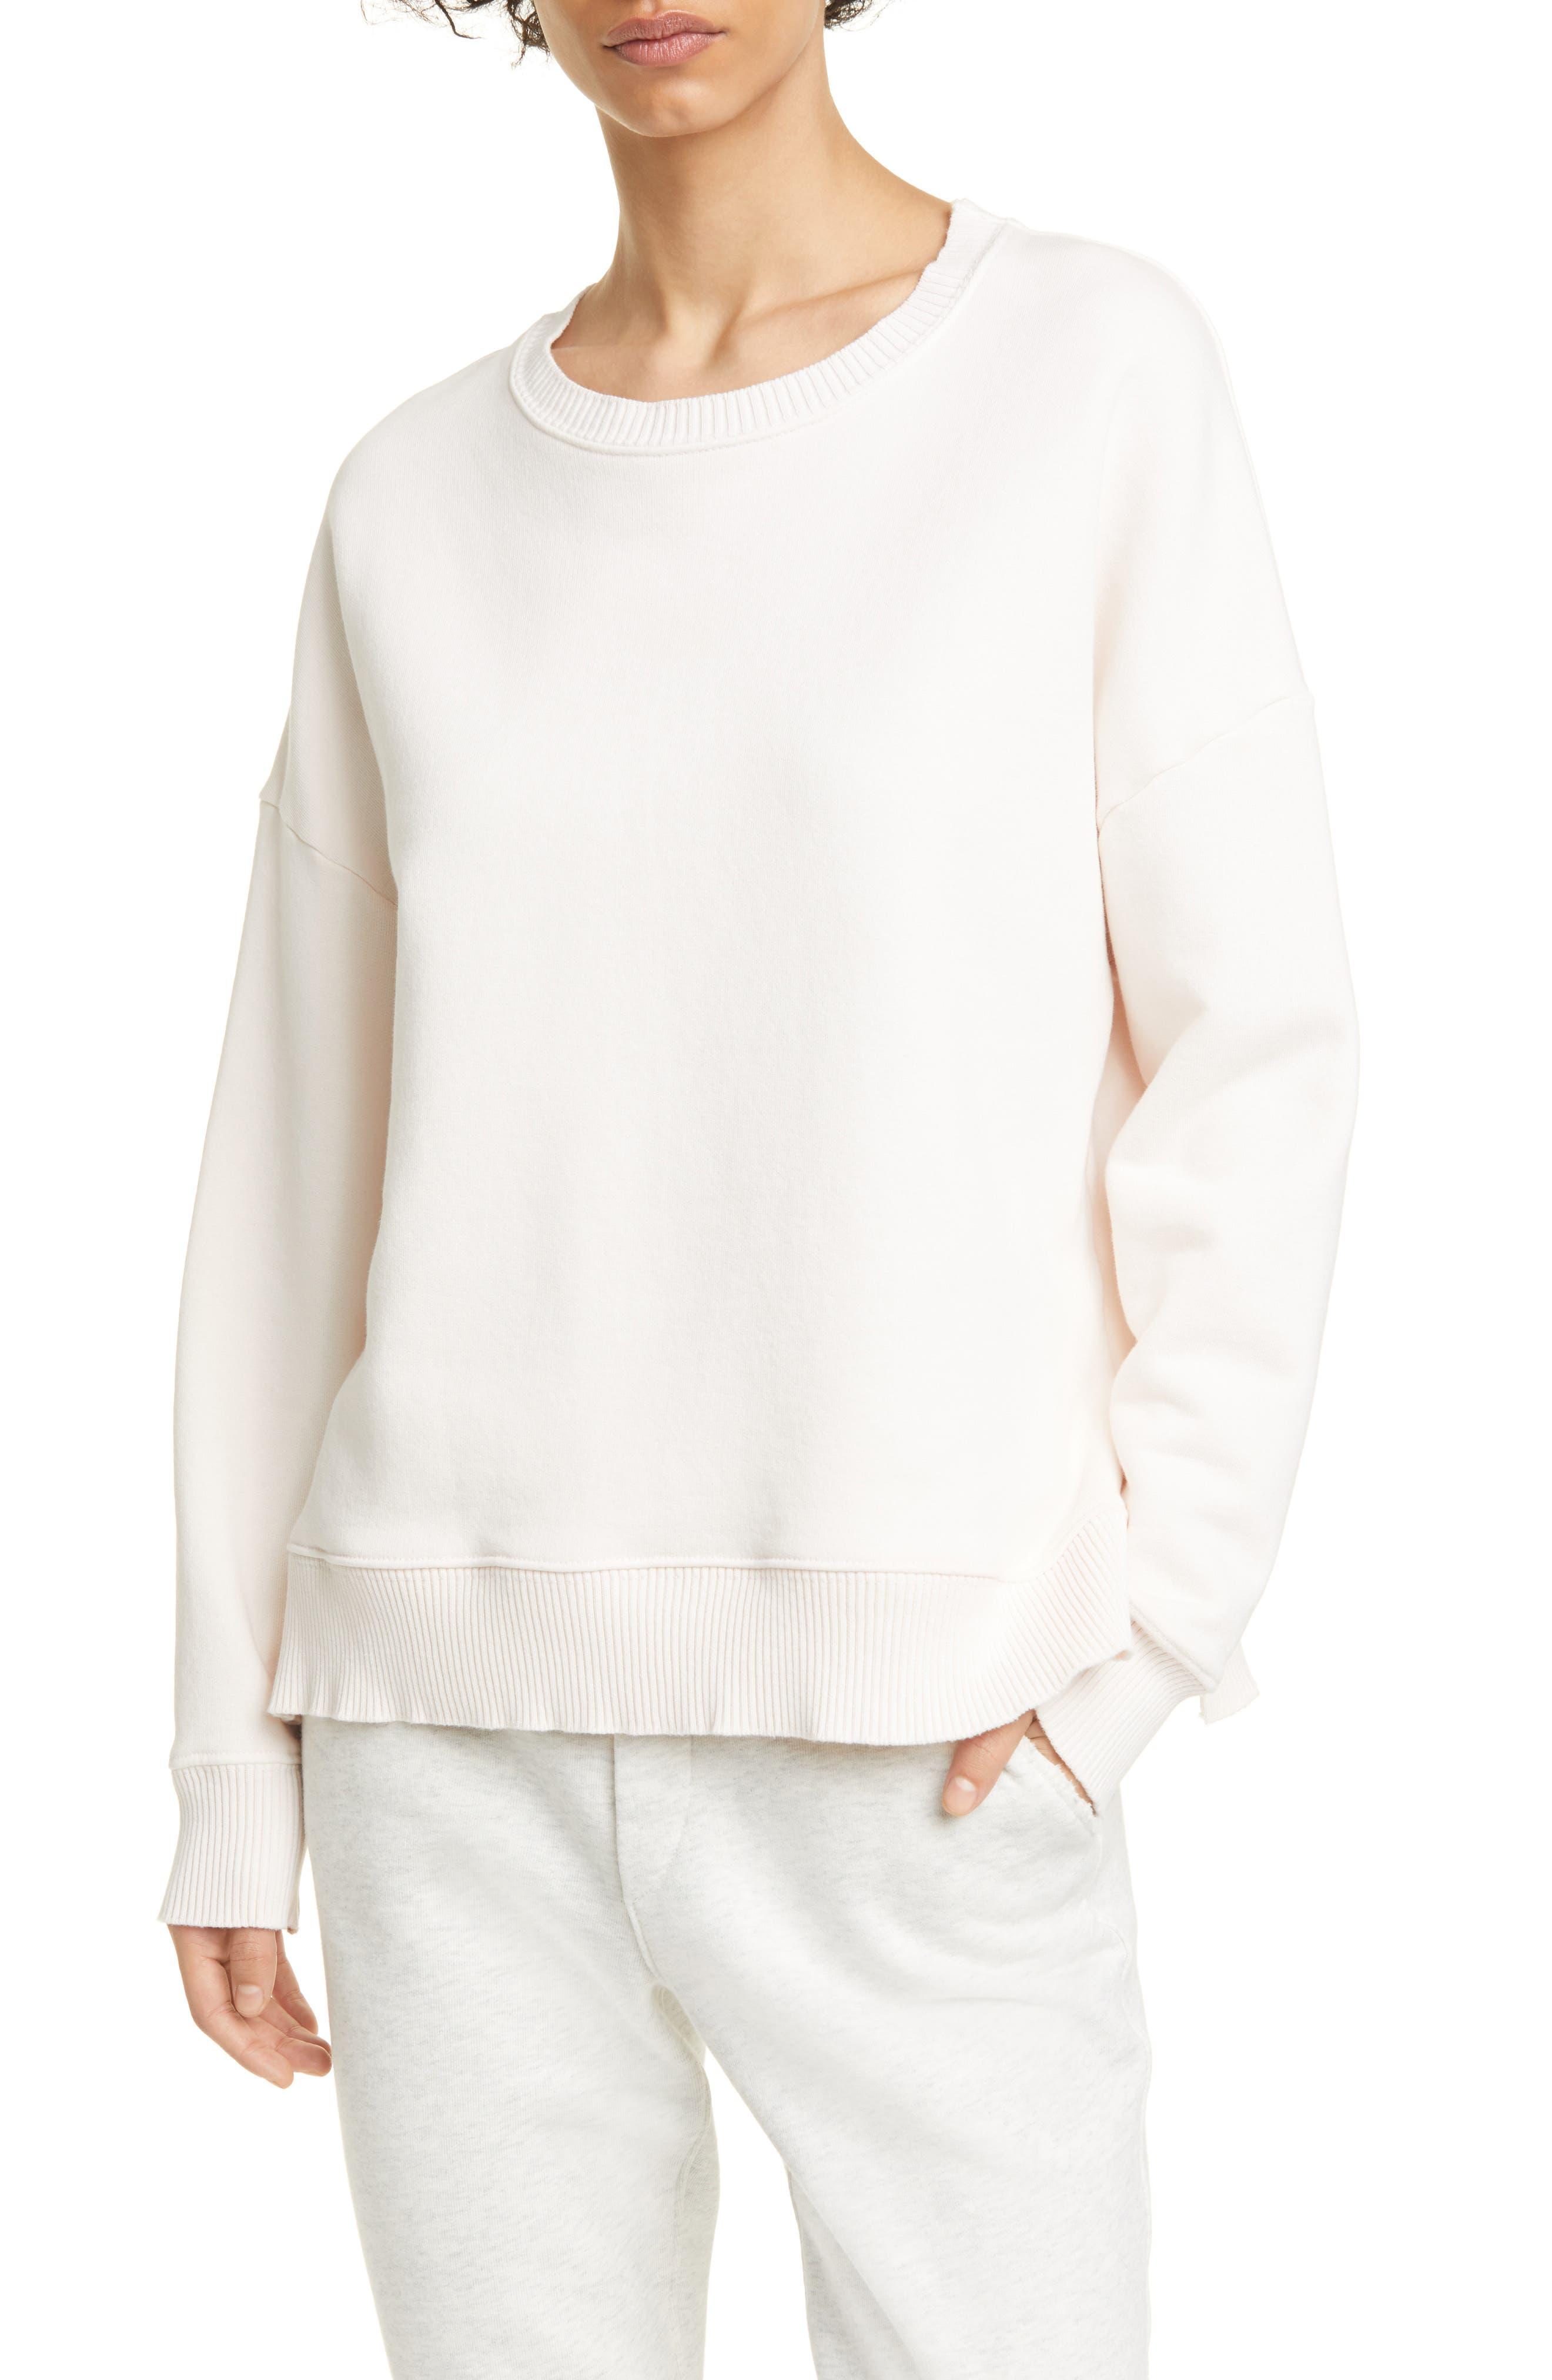 Image of FRANK & EILEEN Ribbed Fleece Pullover Sweatshirt